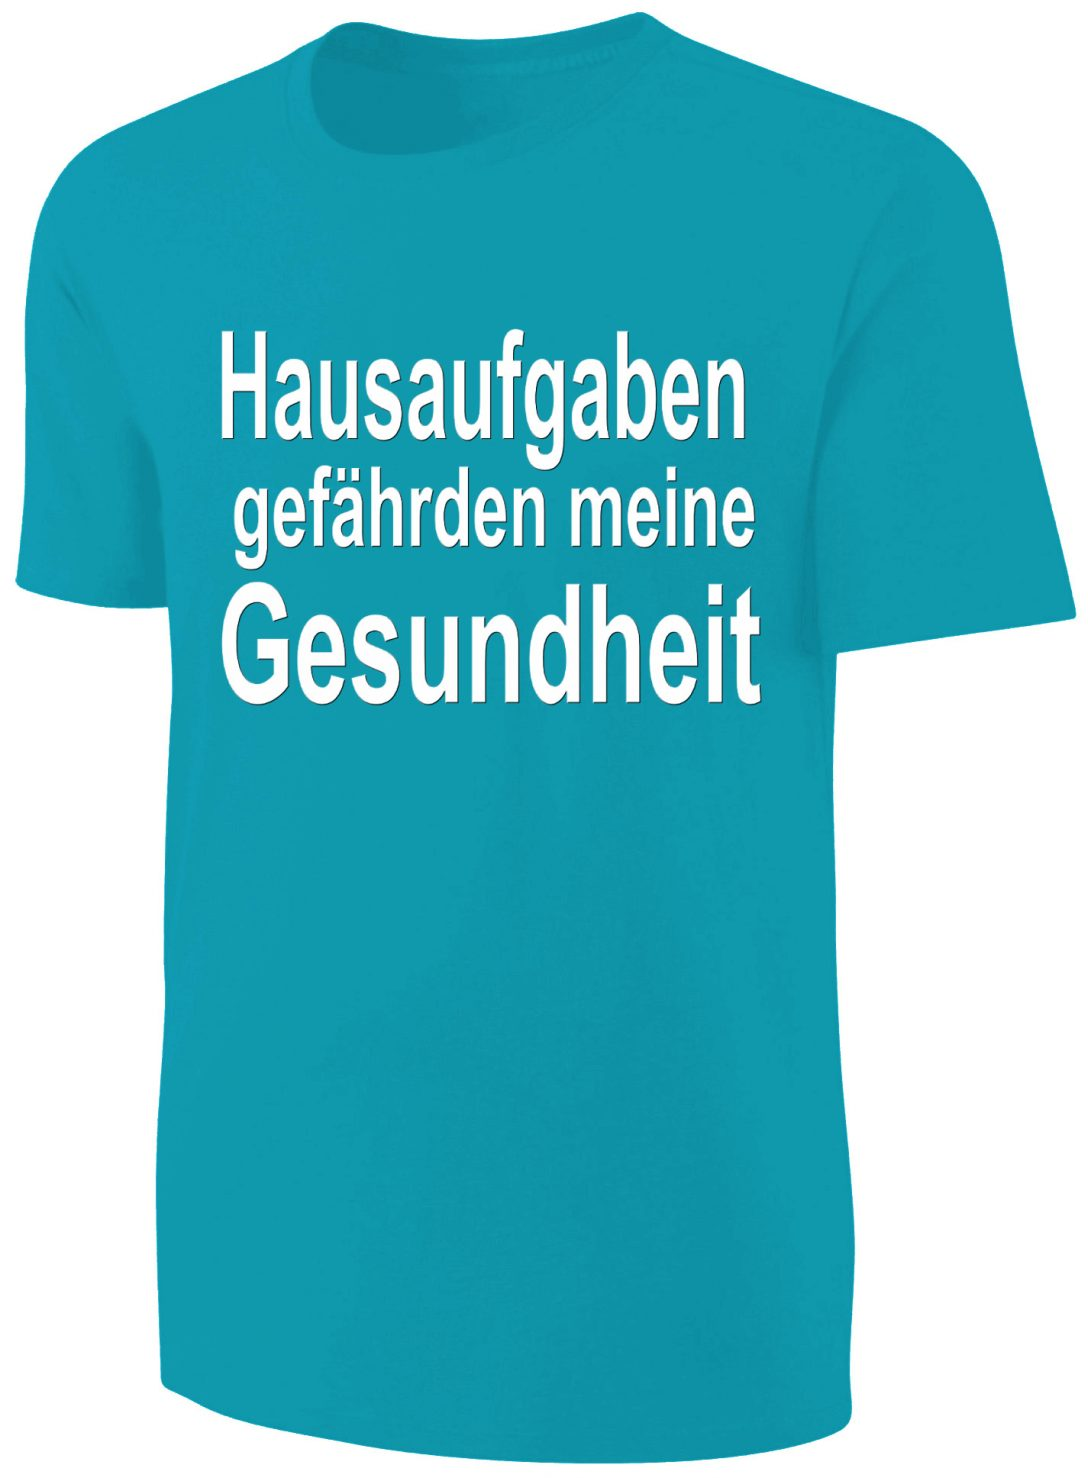 Large Size of Landwirt Sprüche T Shirt Sprüche T Shirt Kinder Sprüche T Shirt Jga Frauen Apres Ski Sprüche T Shirt Küche Sprüche T Shirt